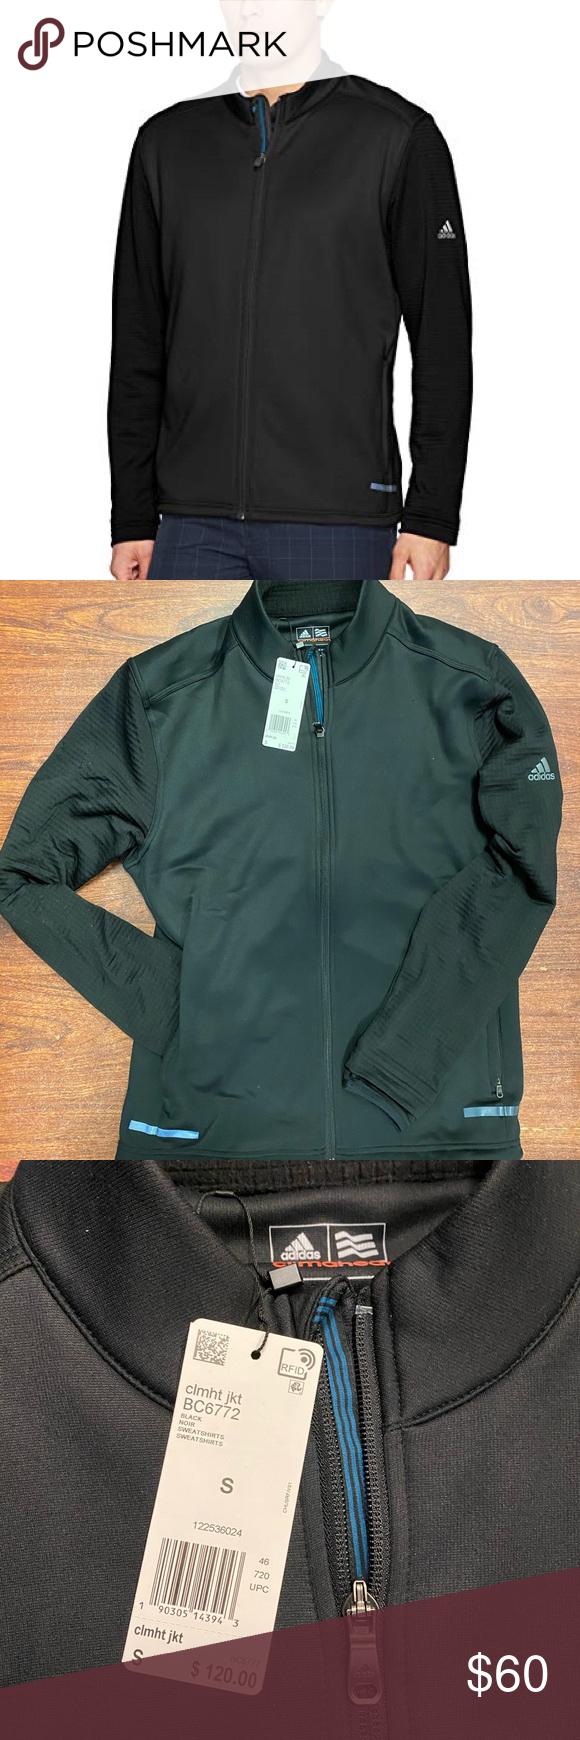 Predownload: Adidas Climaheat Jacket New With Tags Adidas Jackets Coats Performance Jackets Jackets Zip Jackets Clothes Design [ 1740 x 580 Pixel ]